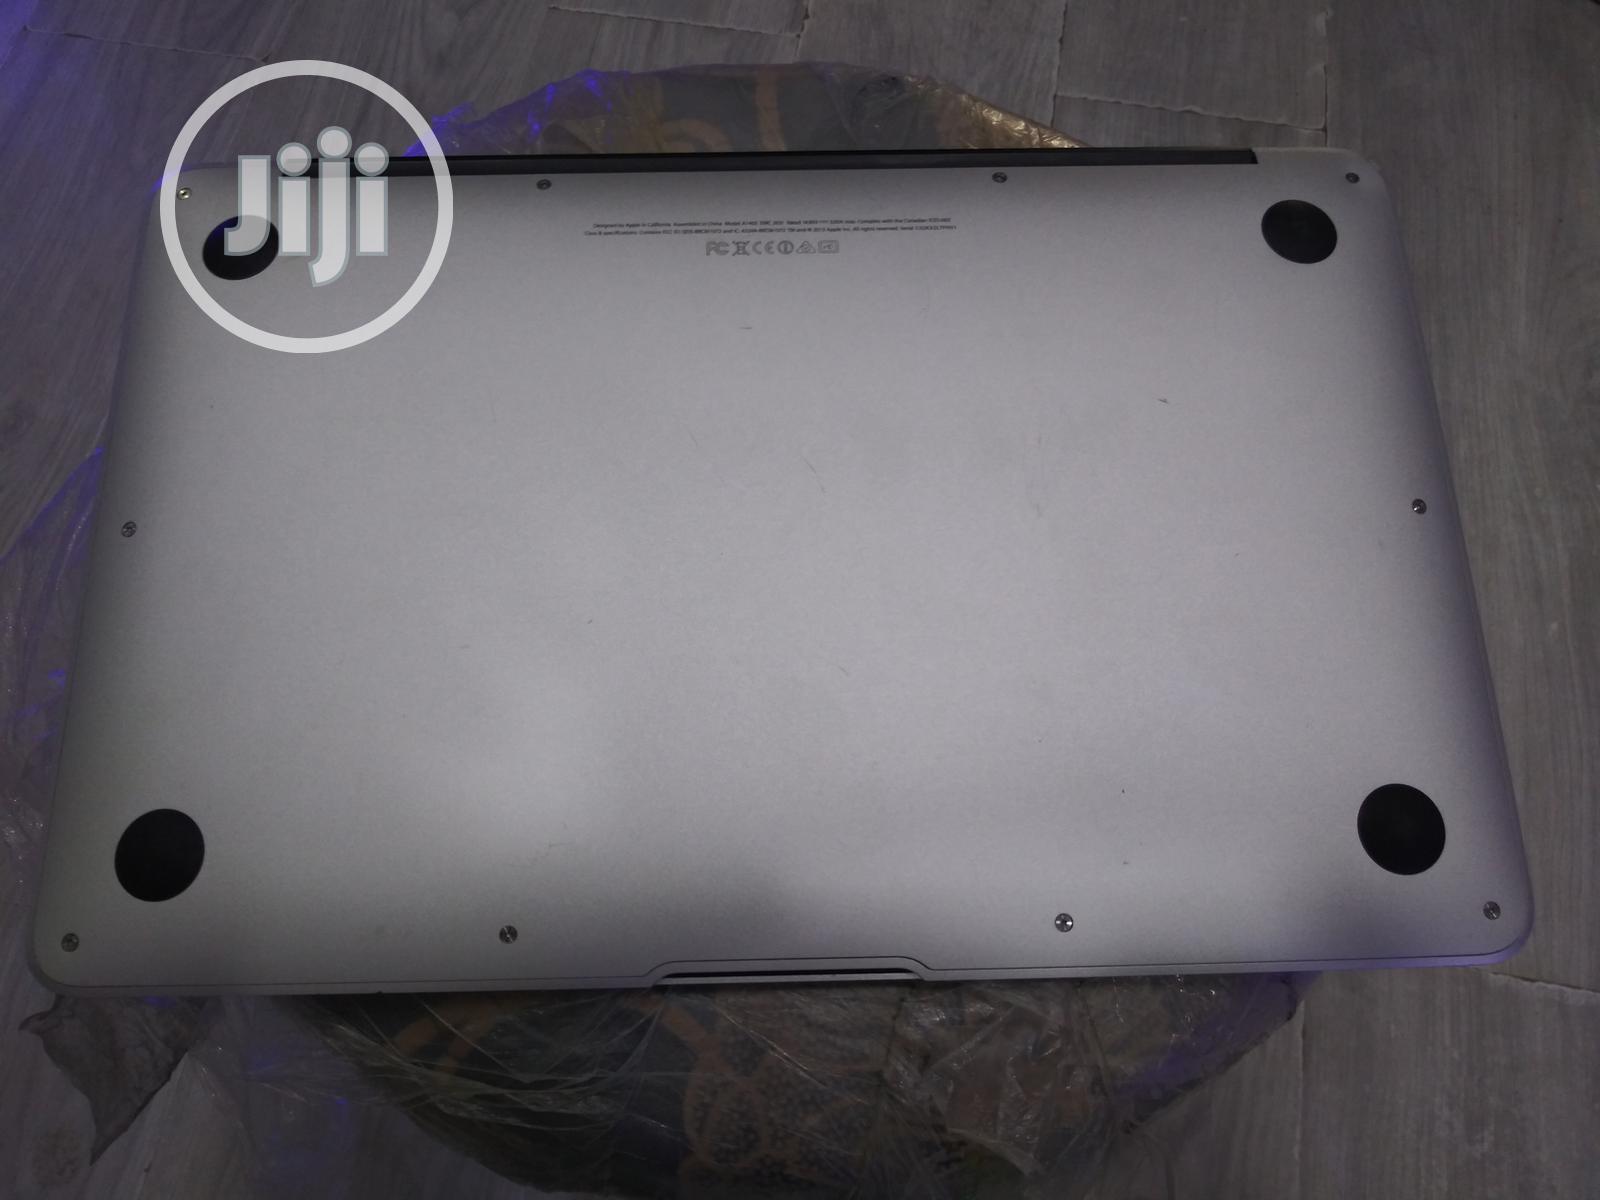 Laptop Apple MacBook Air 8GB Intel Core i7 SSD 256GB | Laptops & Computers for sale in Ikeja, Lagos State, Nigeria